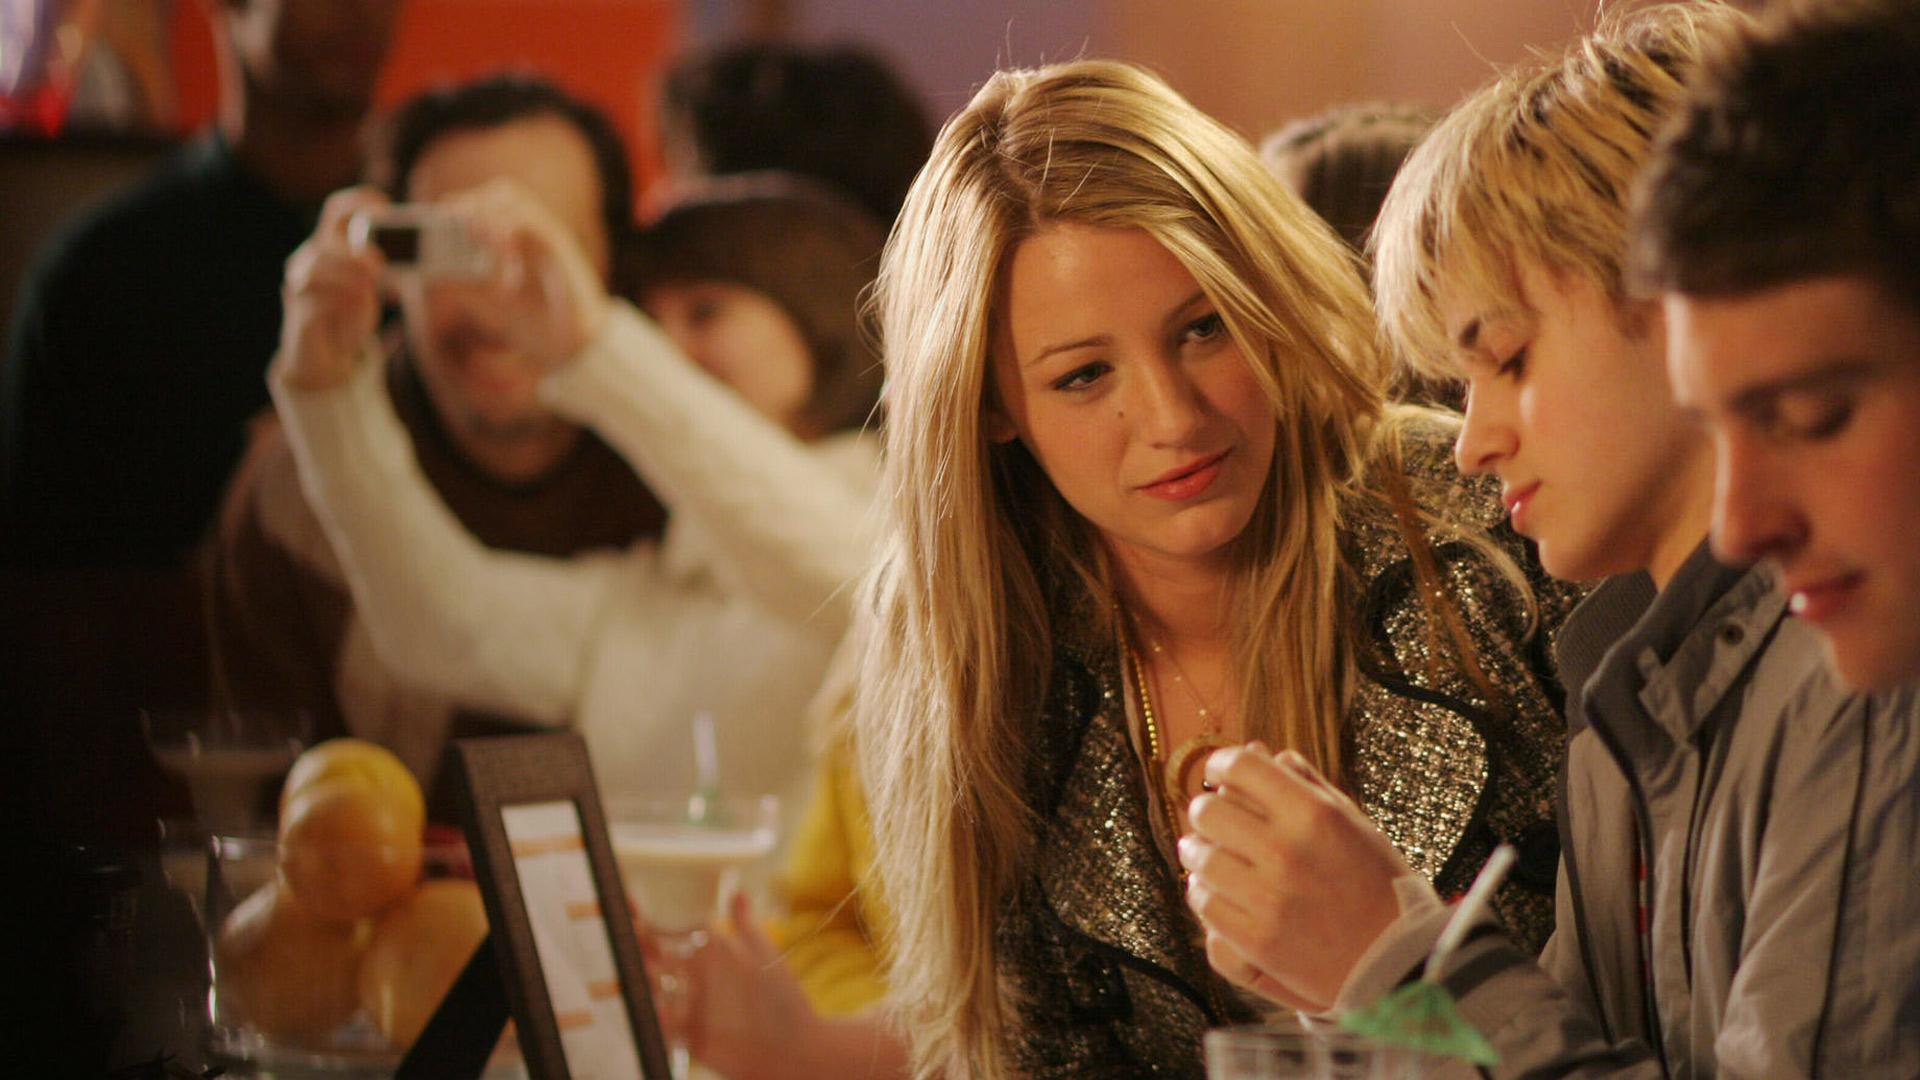 Gossip Girl Staffel 1 Folge 1 Deutsch Ganze Folge